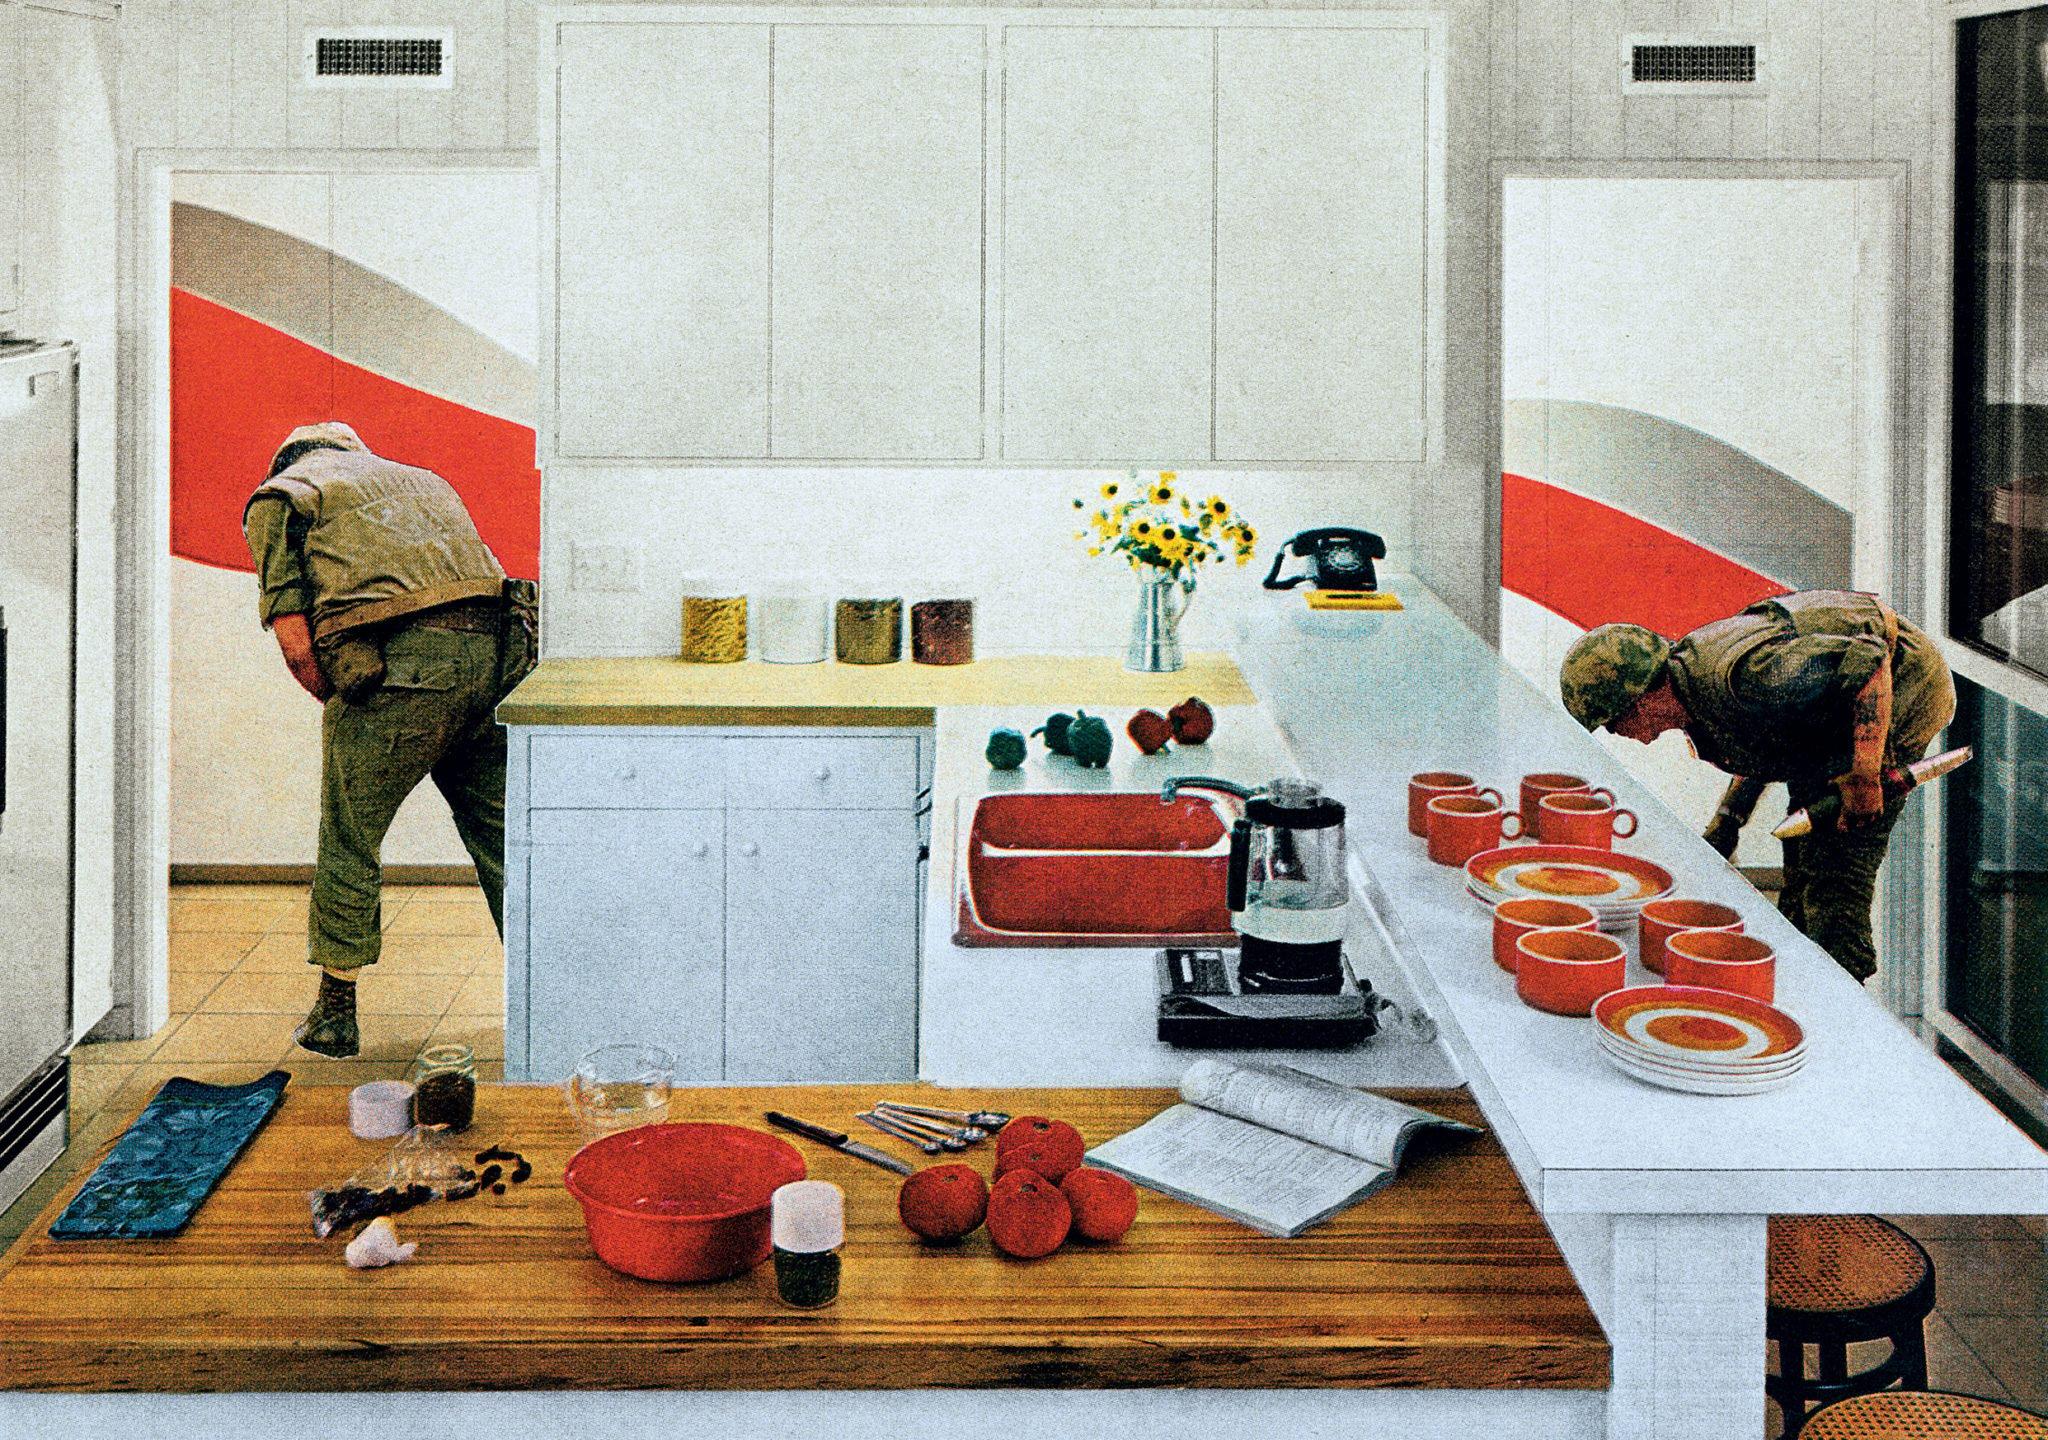 Martha Rosler's Red Stripe Kitchen From The Smithsonian American Art Museum's Artists Respond And Vietnam War 19651975: Smithsonian Blanket Wedding Ring At Reisefeber.org